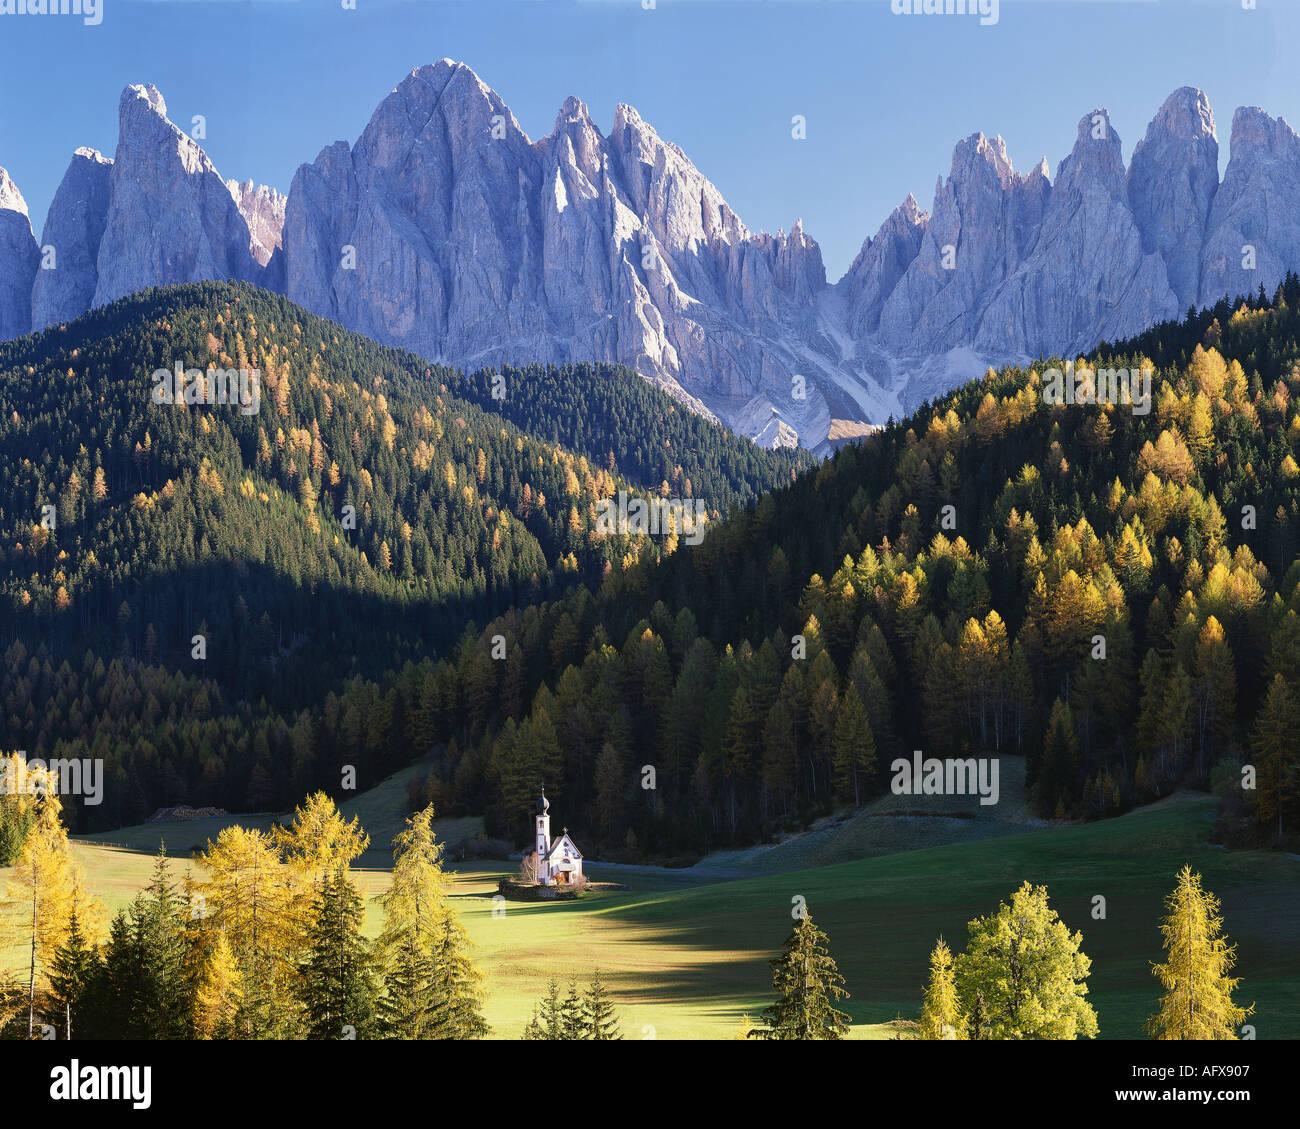 Il - DOLOMITES: St Johann In Saintes et Geisler Spitzen Montagne Photo Stock